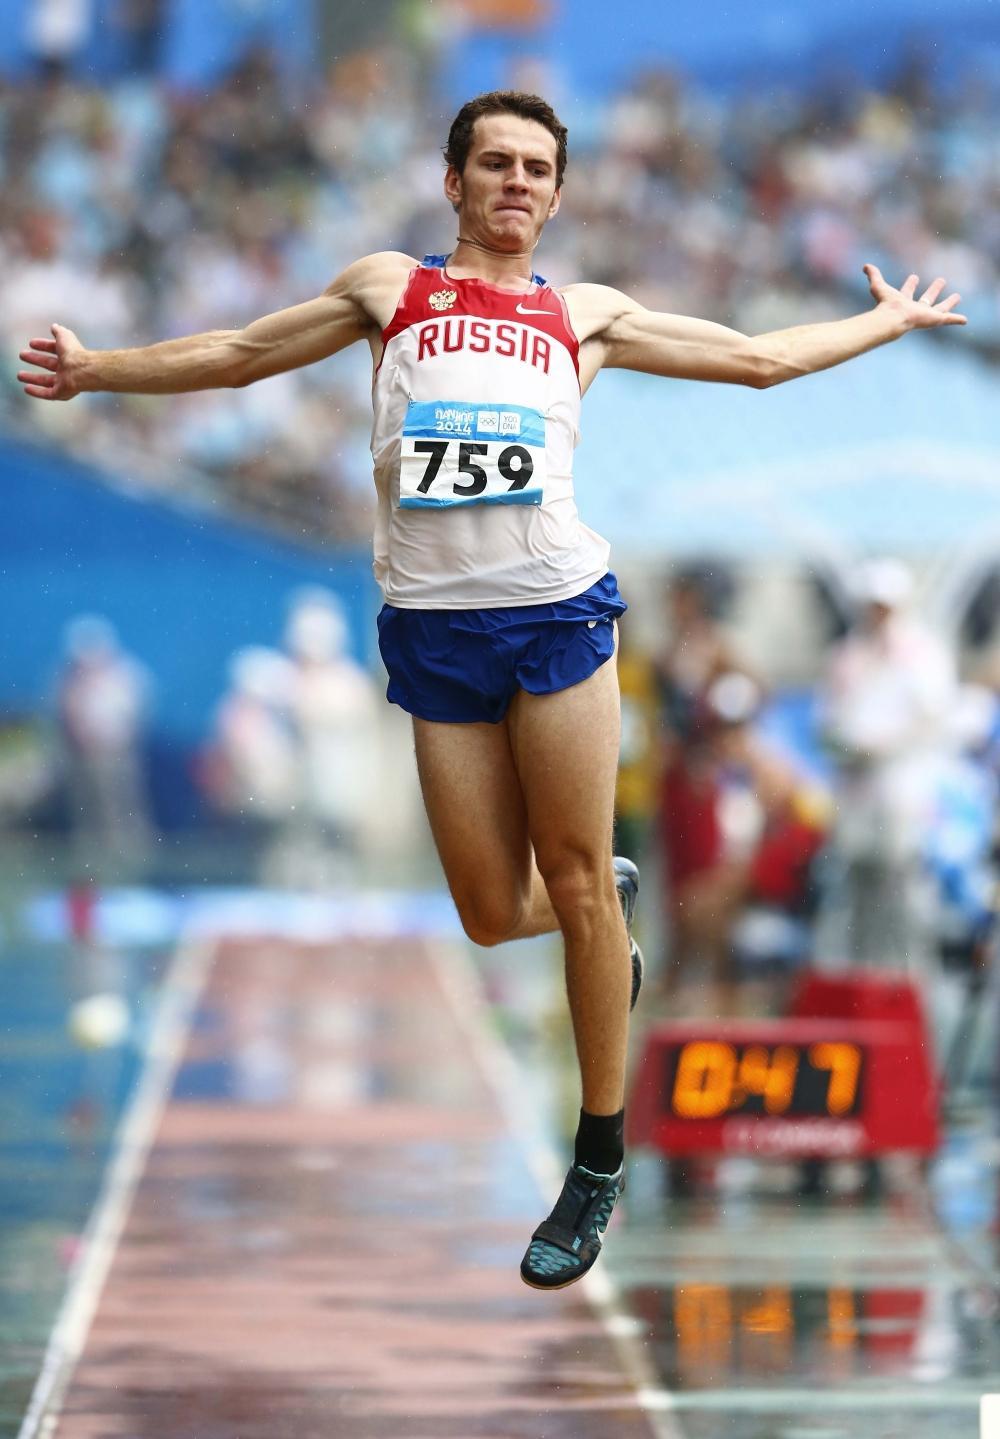 Анатолий божко фото легкая атлетика минск